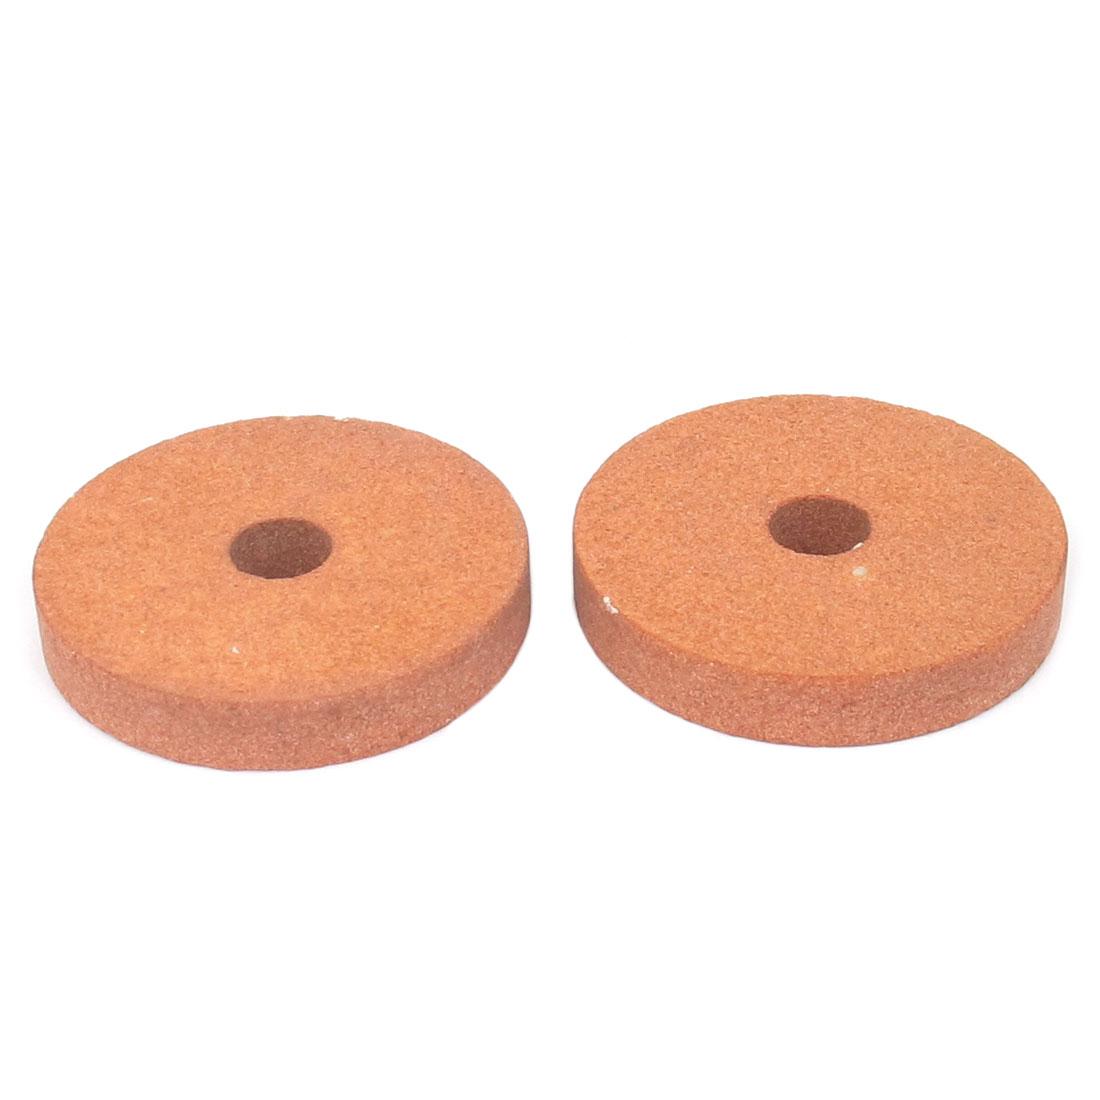 Carborundum Abrasives Round Grinding Wheel Brick Red 50 x 8 x 10mm 2 Pcs